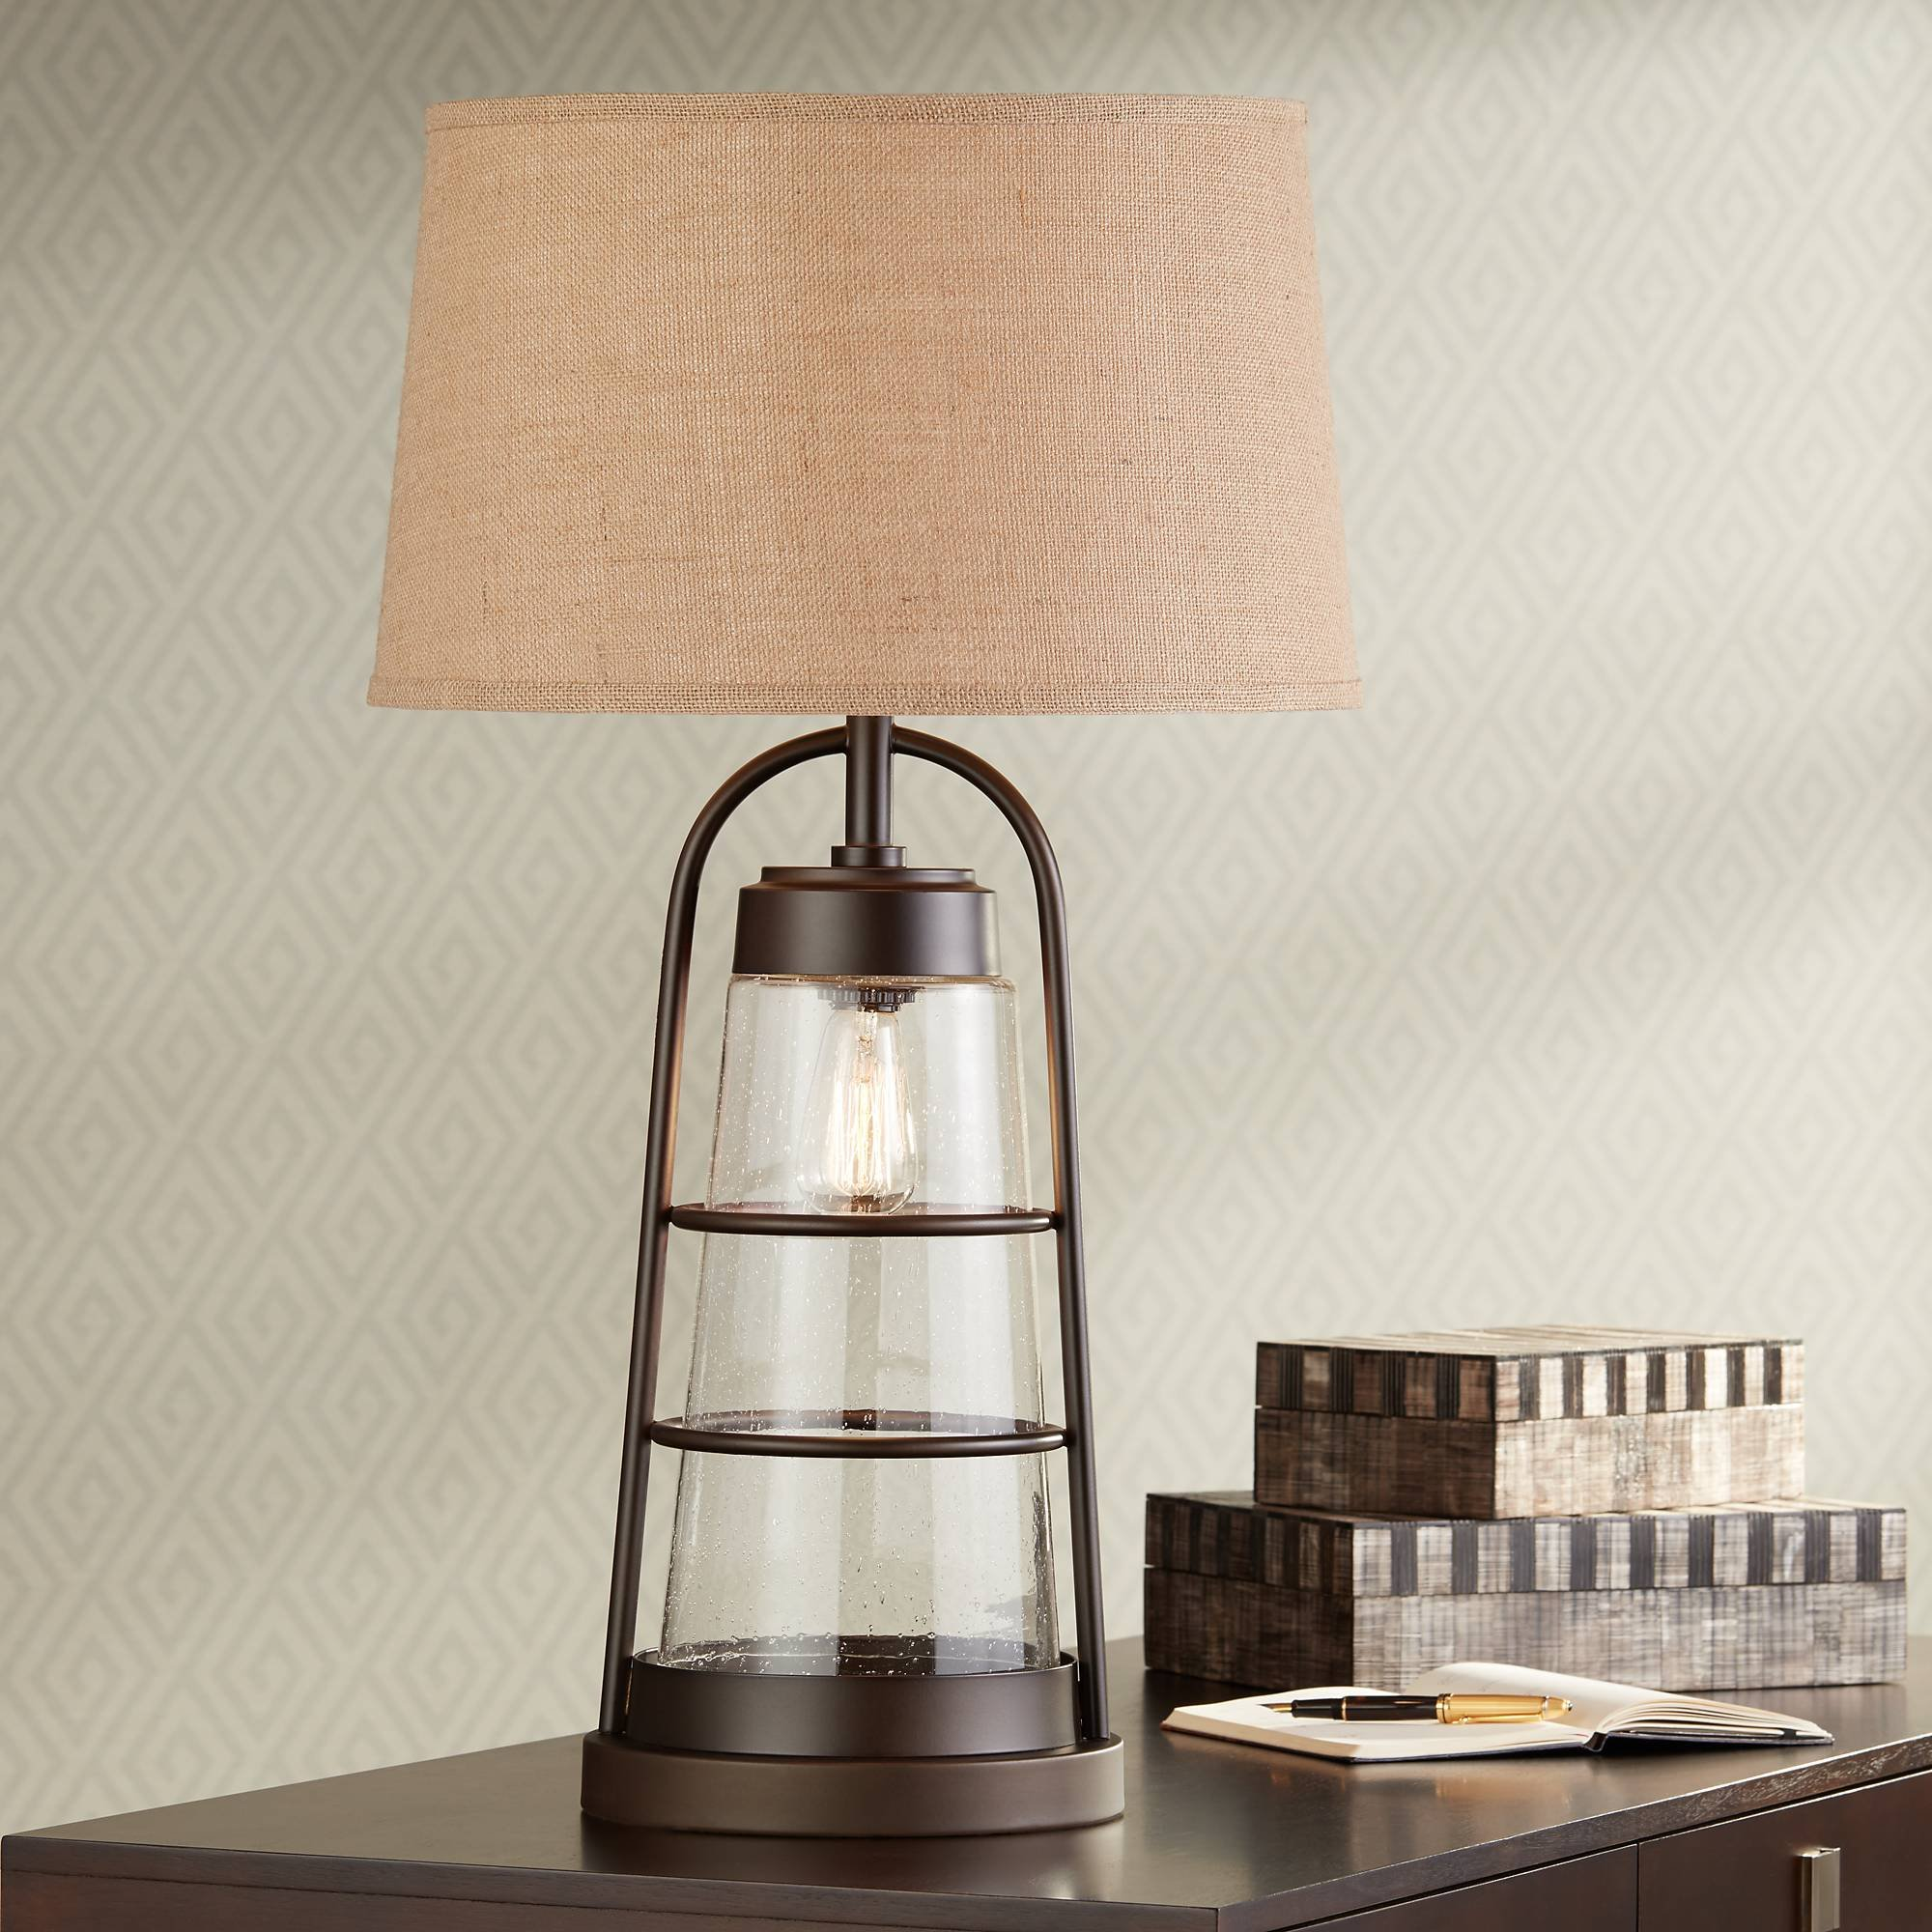 Industrial Lantern Table Night Light